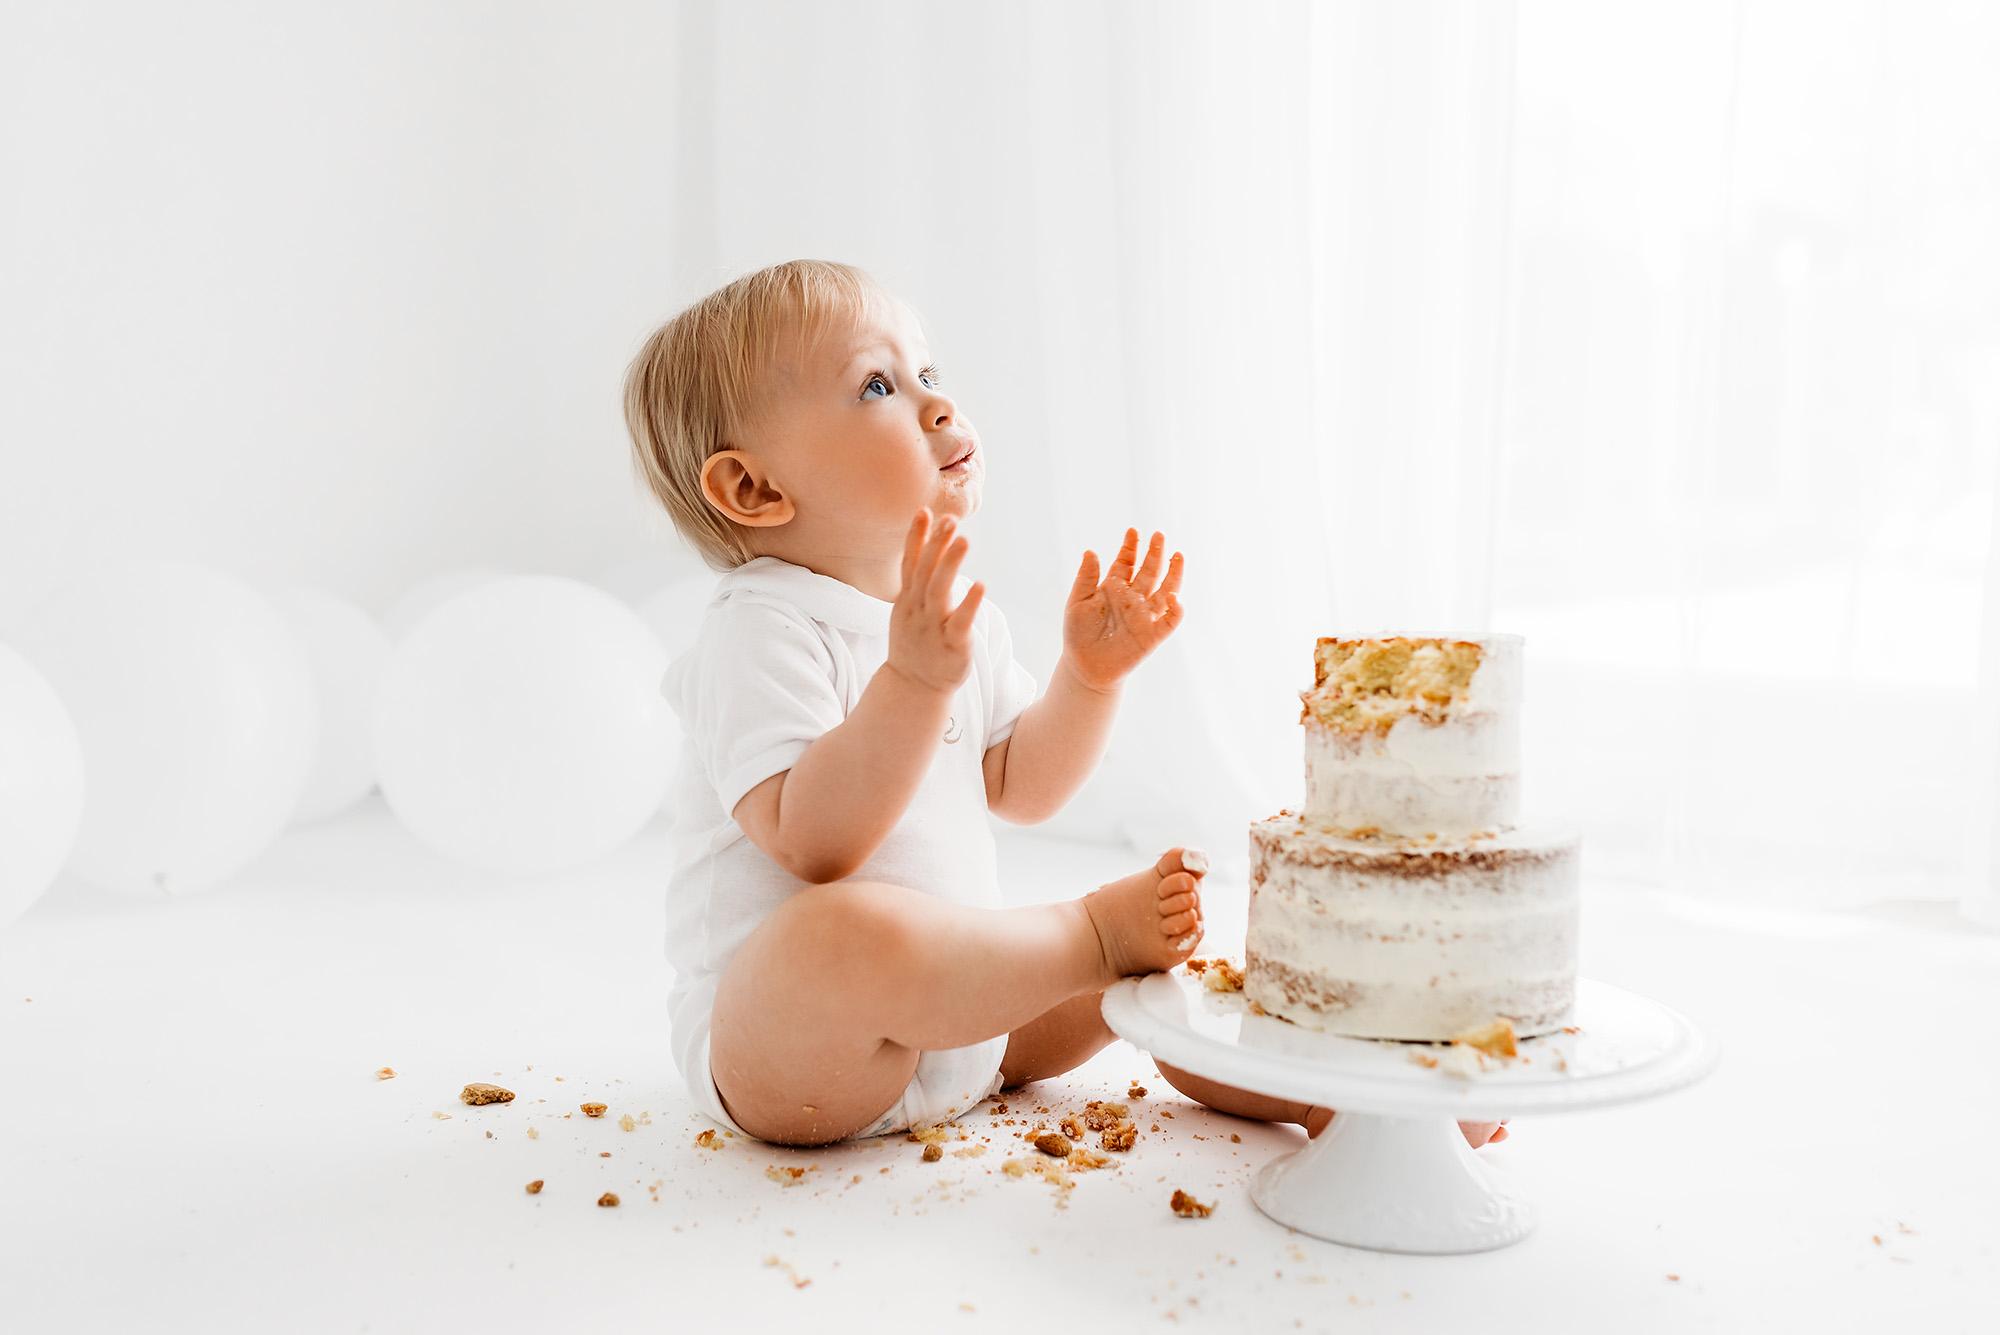 Cake Smash Photographer Barnsley , baby clapping and dancing